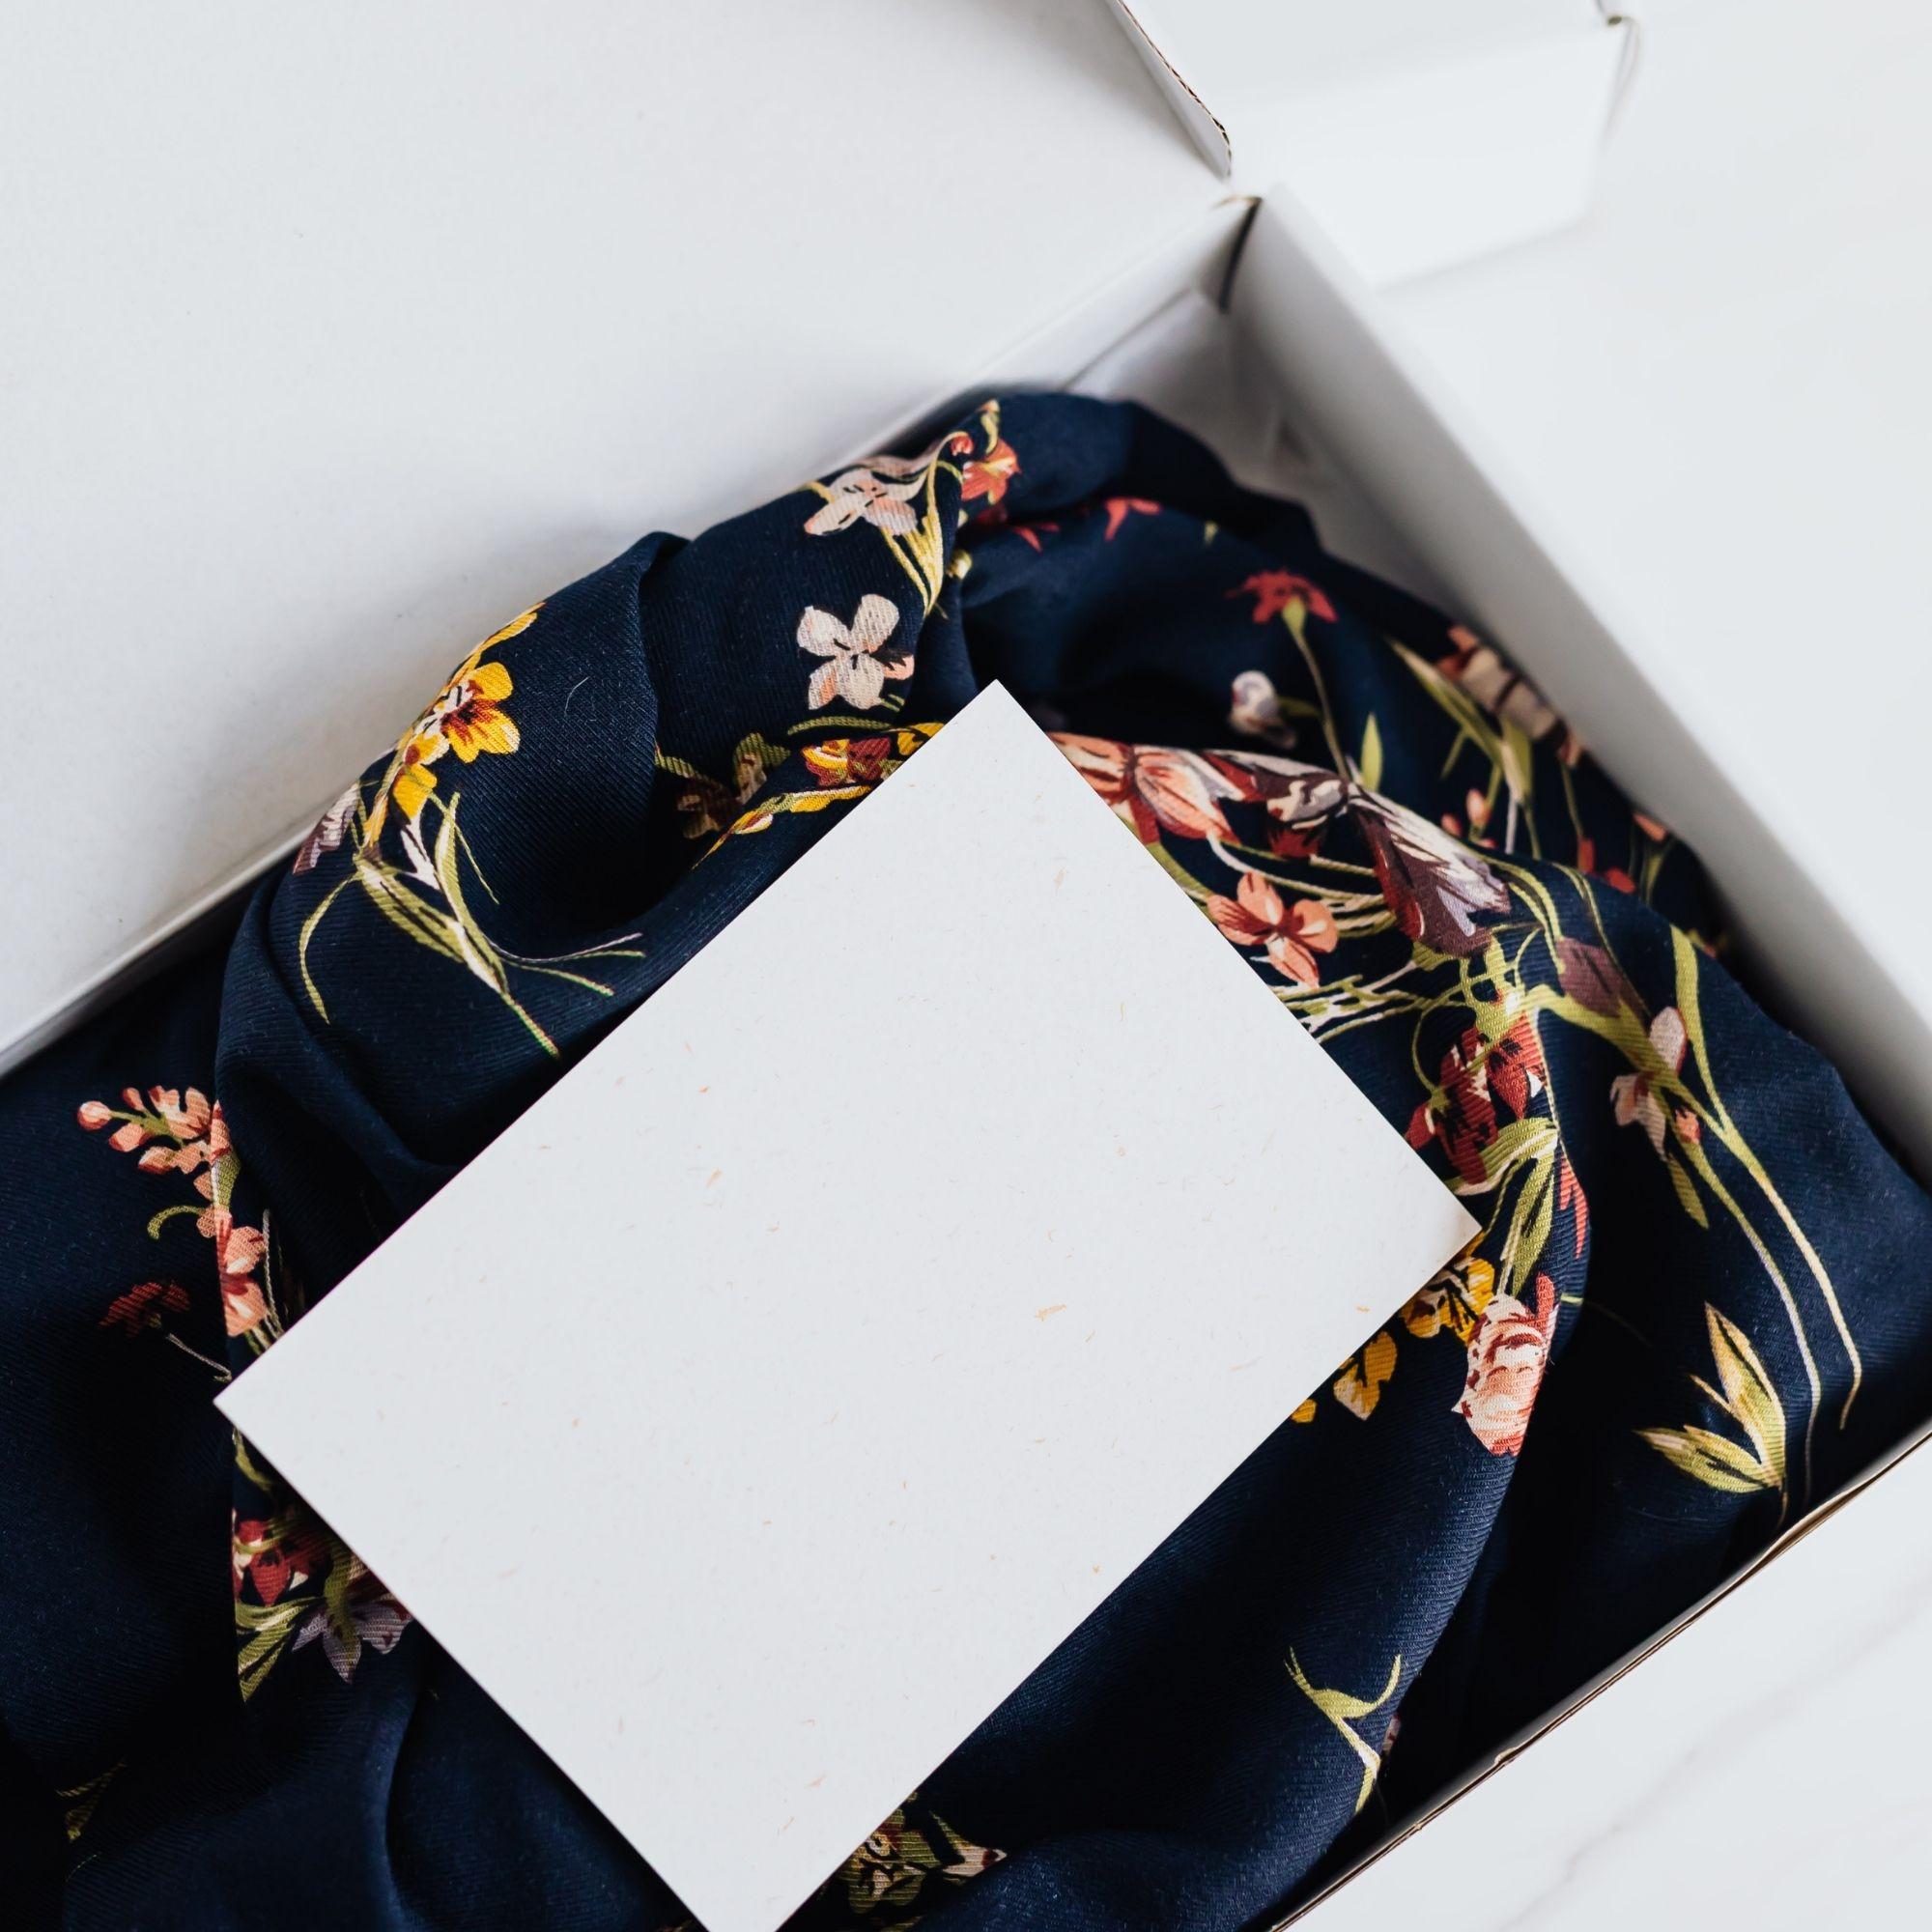 Silk floral print cloth in white gift box